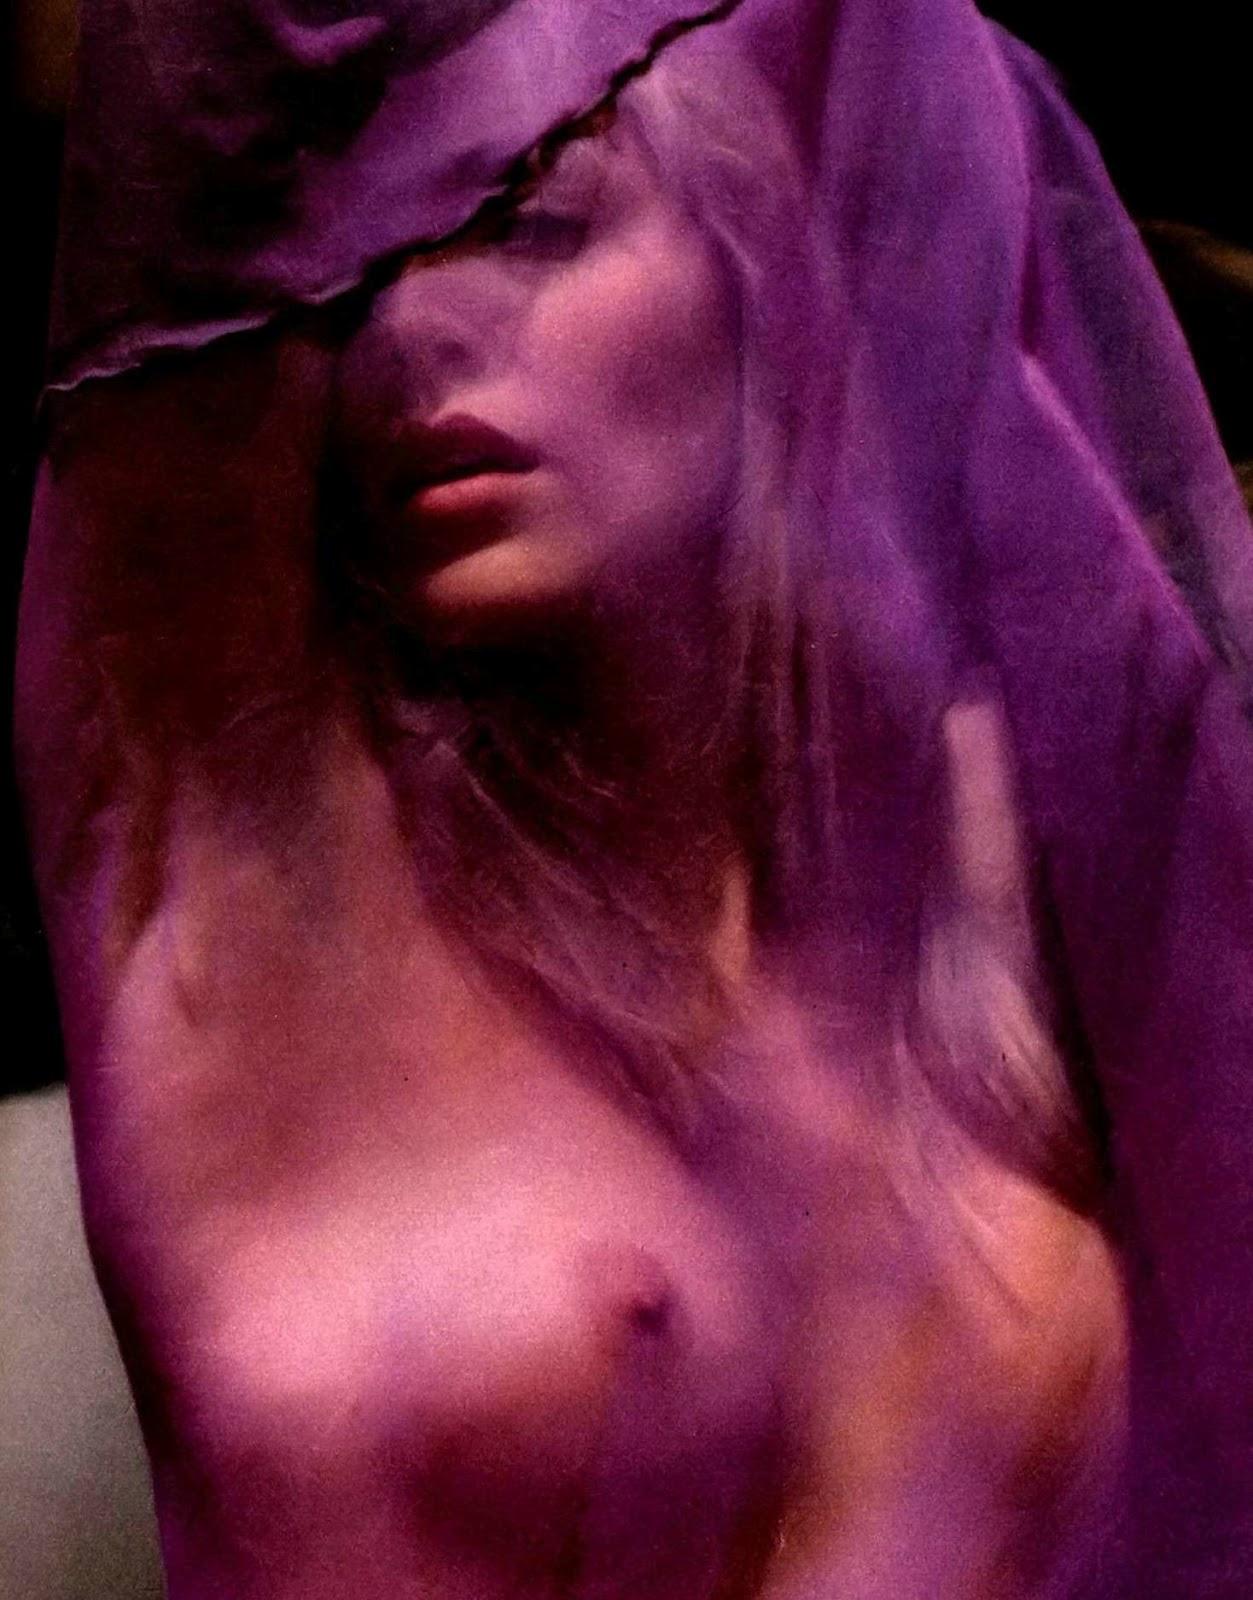 http://2.bp.blogspot.com/-ZIB00qjOsUw/TzOd5NC6vPI/AAAAAAAADB8/4T-4GqcAUBE/s1600/sharon_stone_47415.jpg